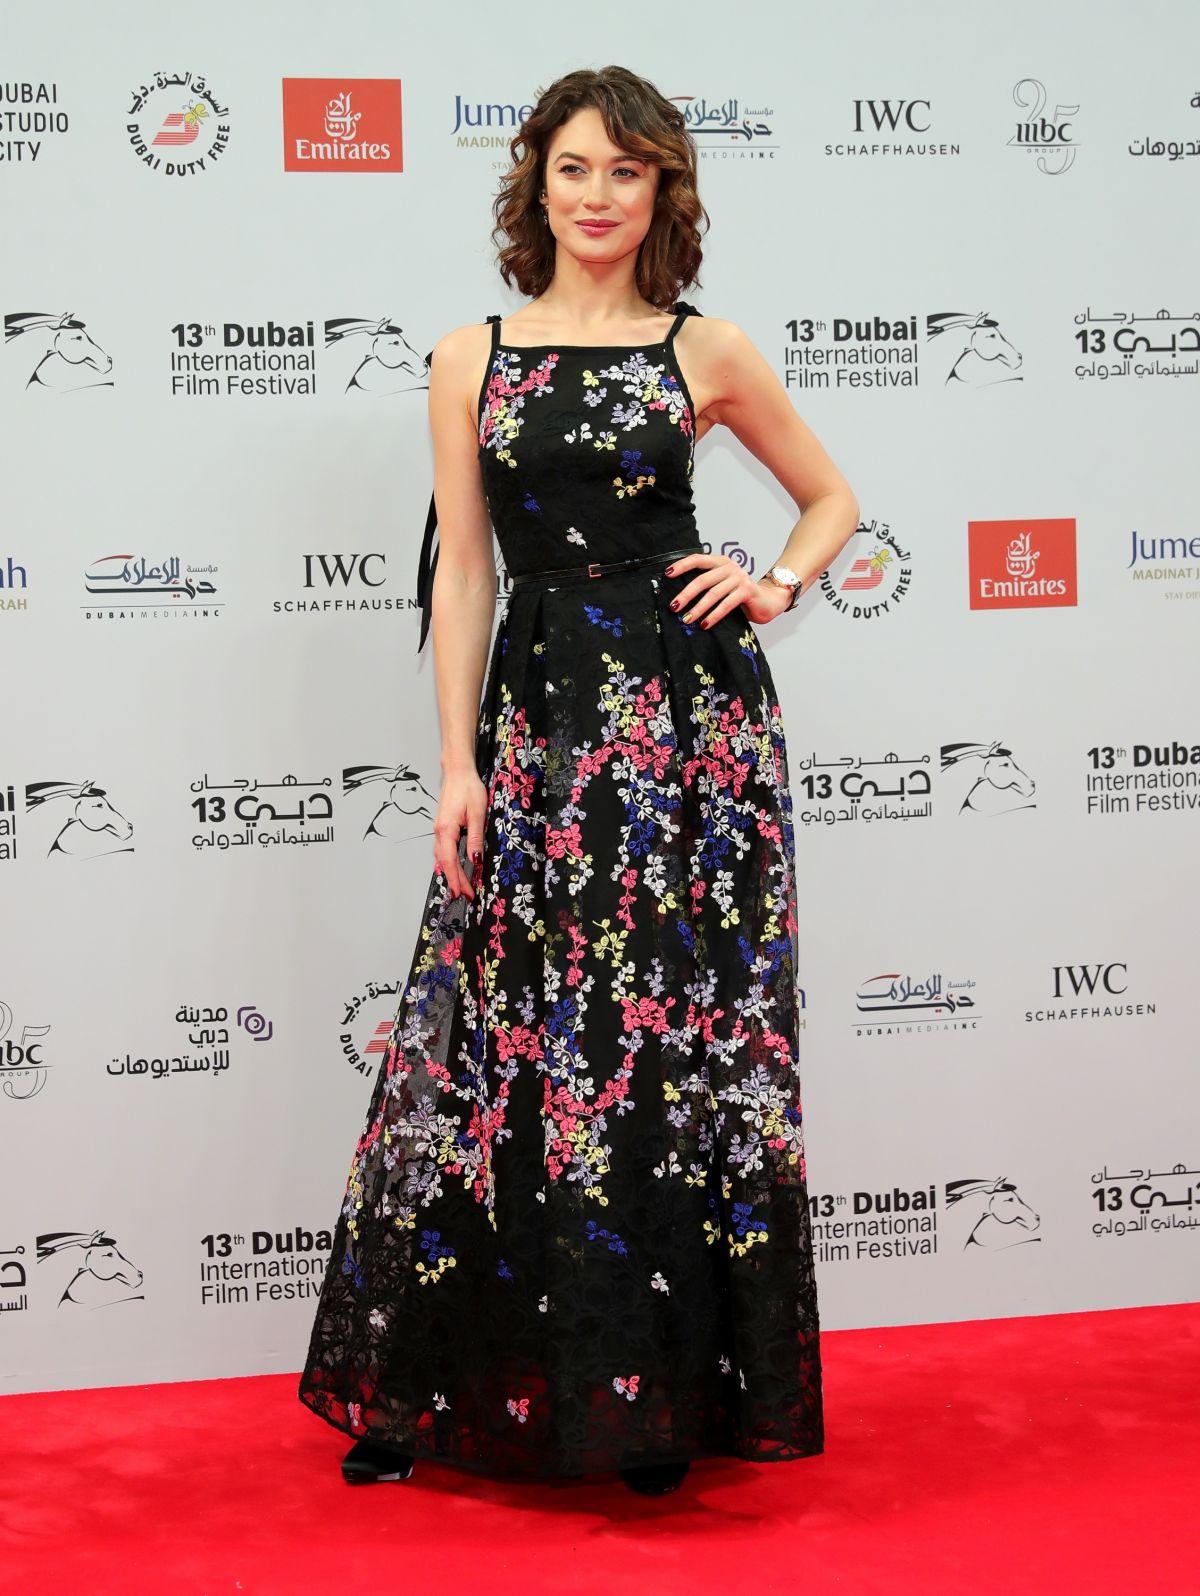 OLGA KURYLENKO at 13th Annual Dubai International Film Festival in Dubai 12/07/2016